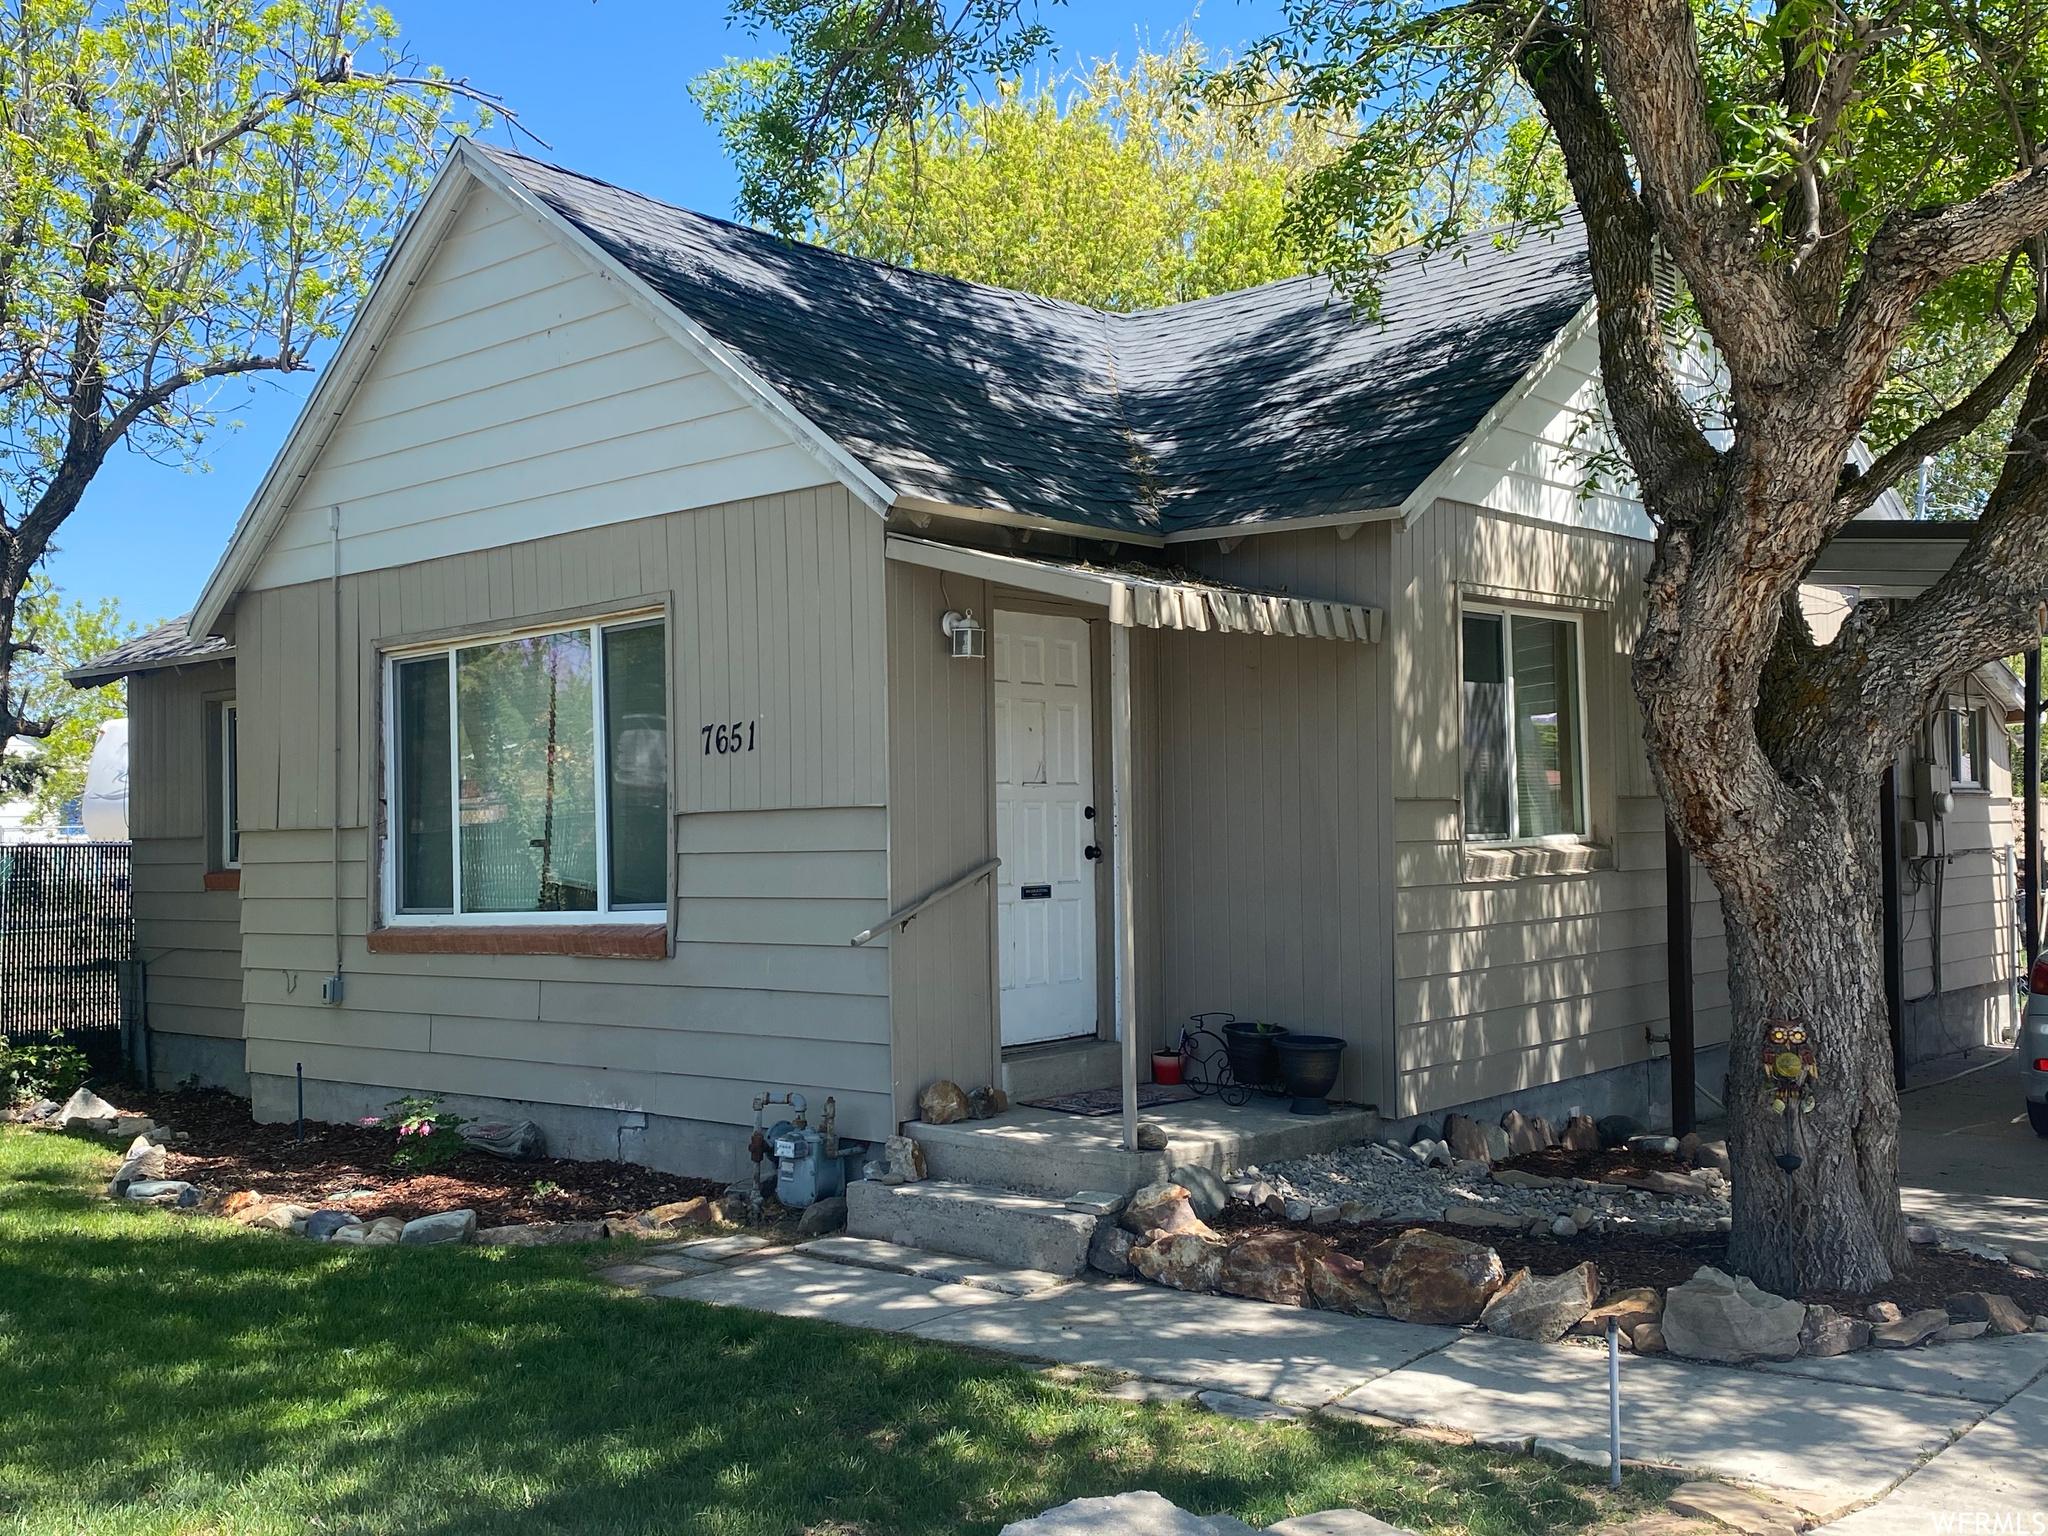 7651 S 2200, West Jordan, Utah 84084, 3 Bedrooms Bedrooms, ,1 BathroomBathrooms,Single Family,For Sale,7651 S 2200,1740430